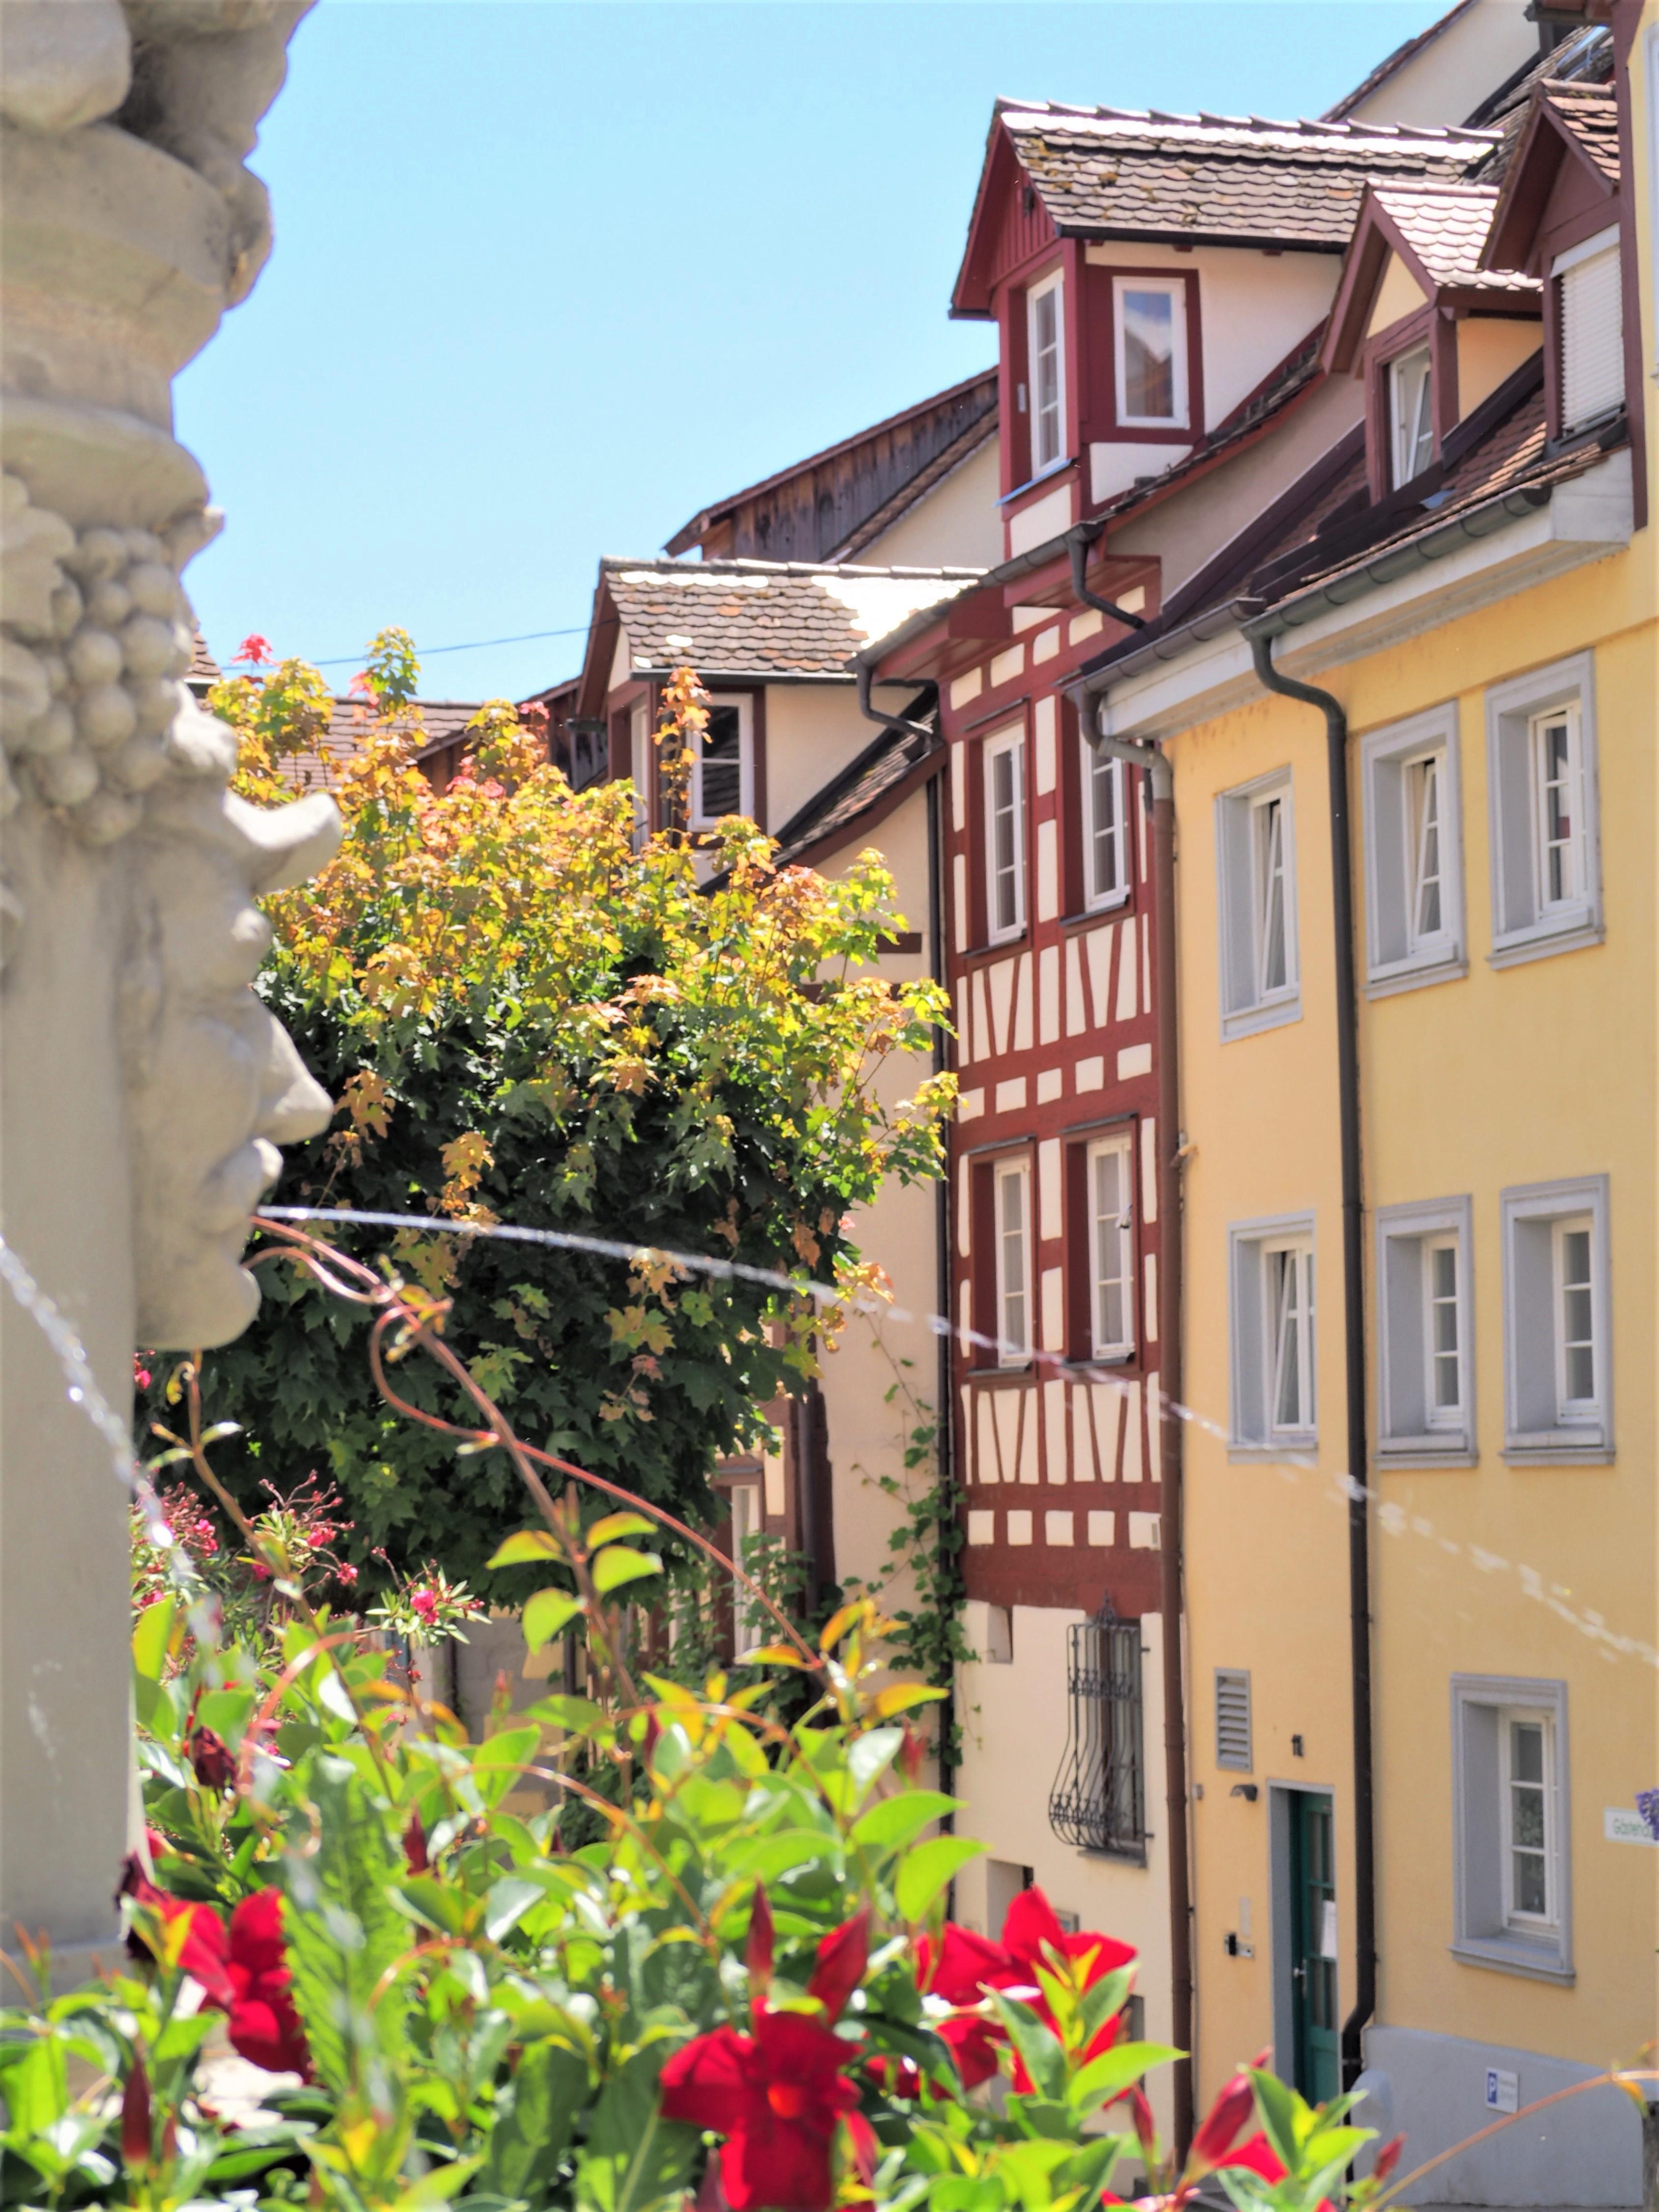 meersburg-fontaine-et-maisons-colorees.